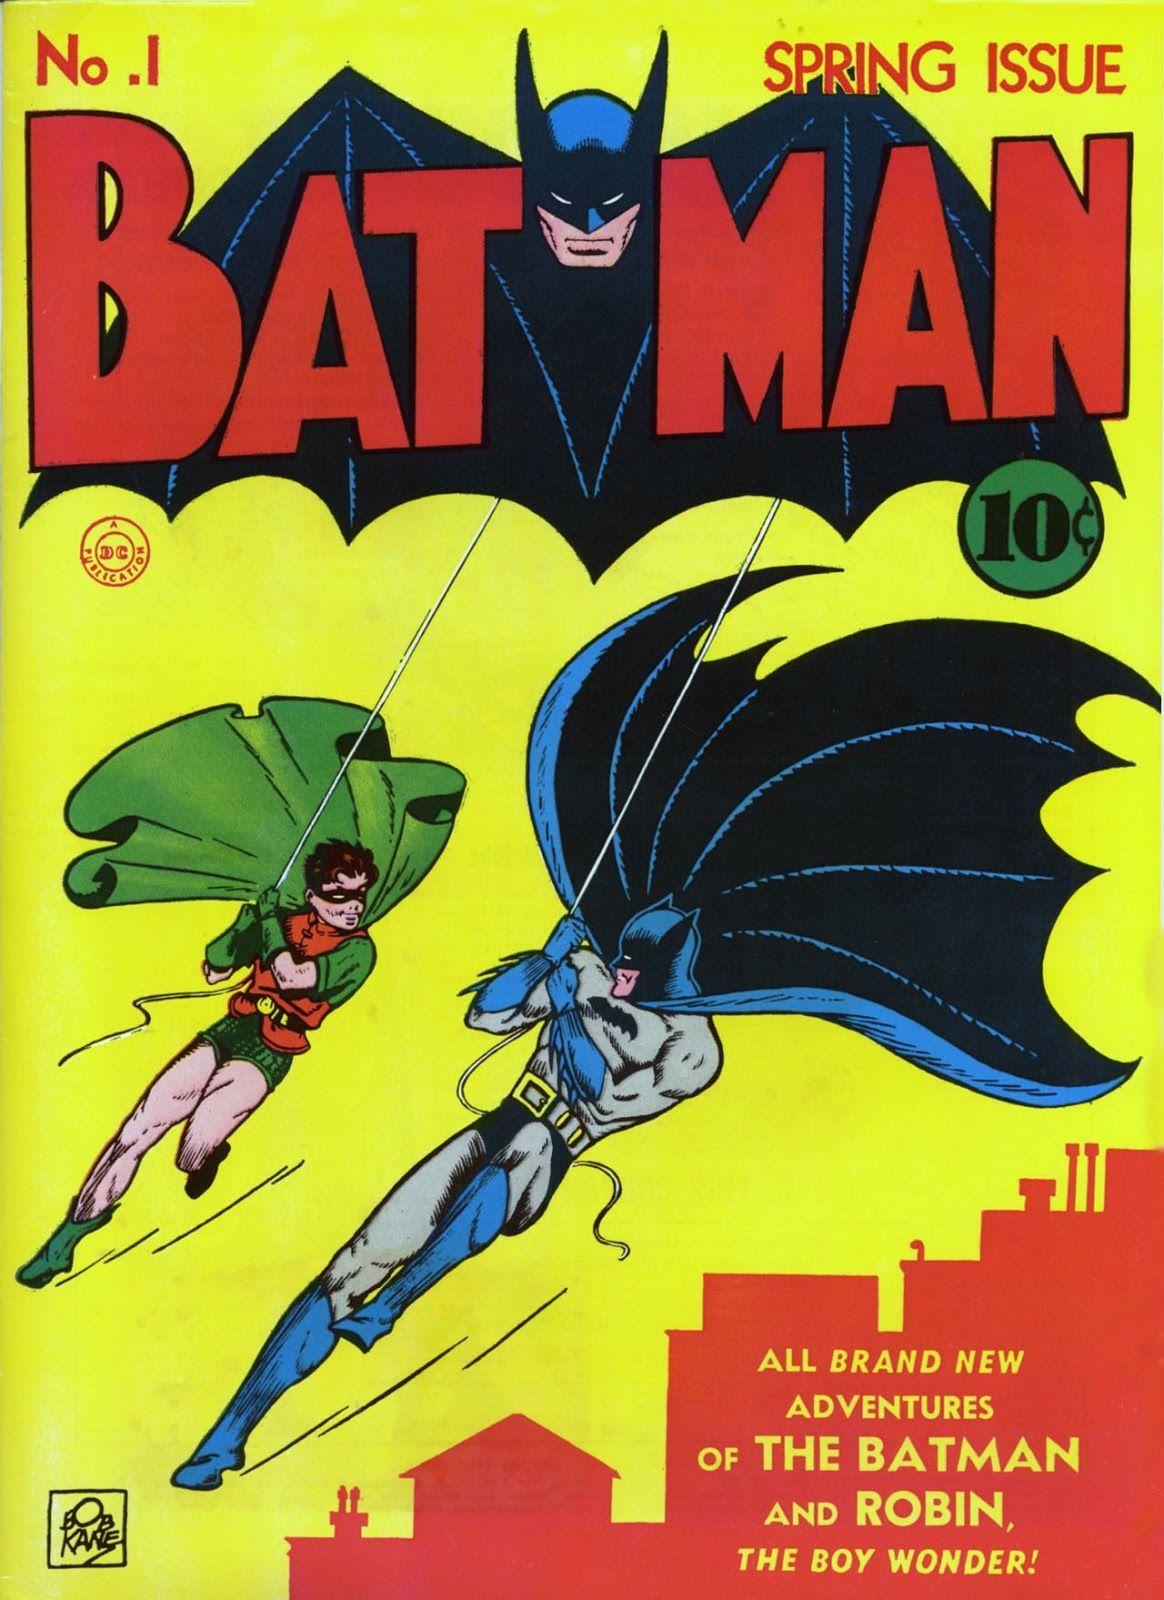 Batman #1 (Writer: Bill Finger, Paul Gustavson Artist: Bob Kane, George Papp, Paul Gustavson, Raymond Perry)